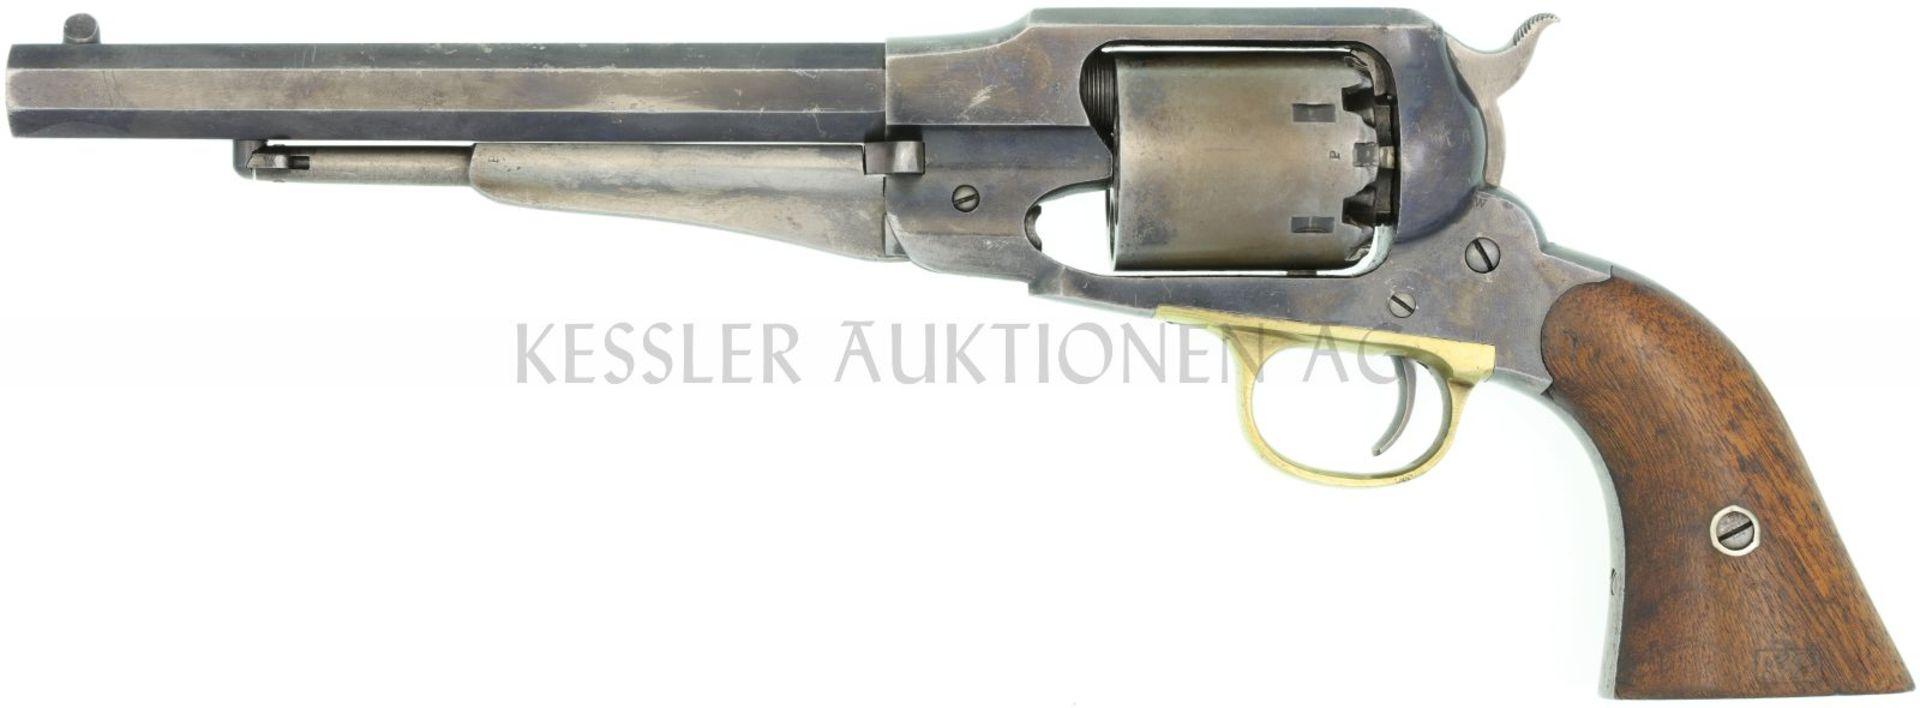 Perkussionsrevolver, Remington 1858 New Model Army, Kal. .44 LL 202mm, streichbrünierte